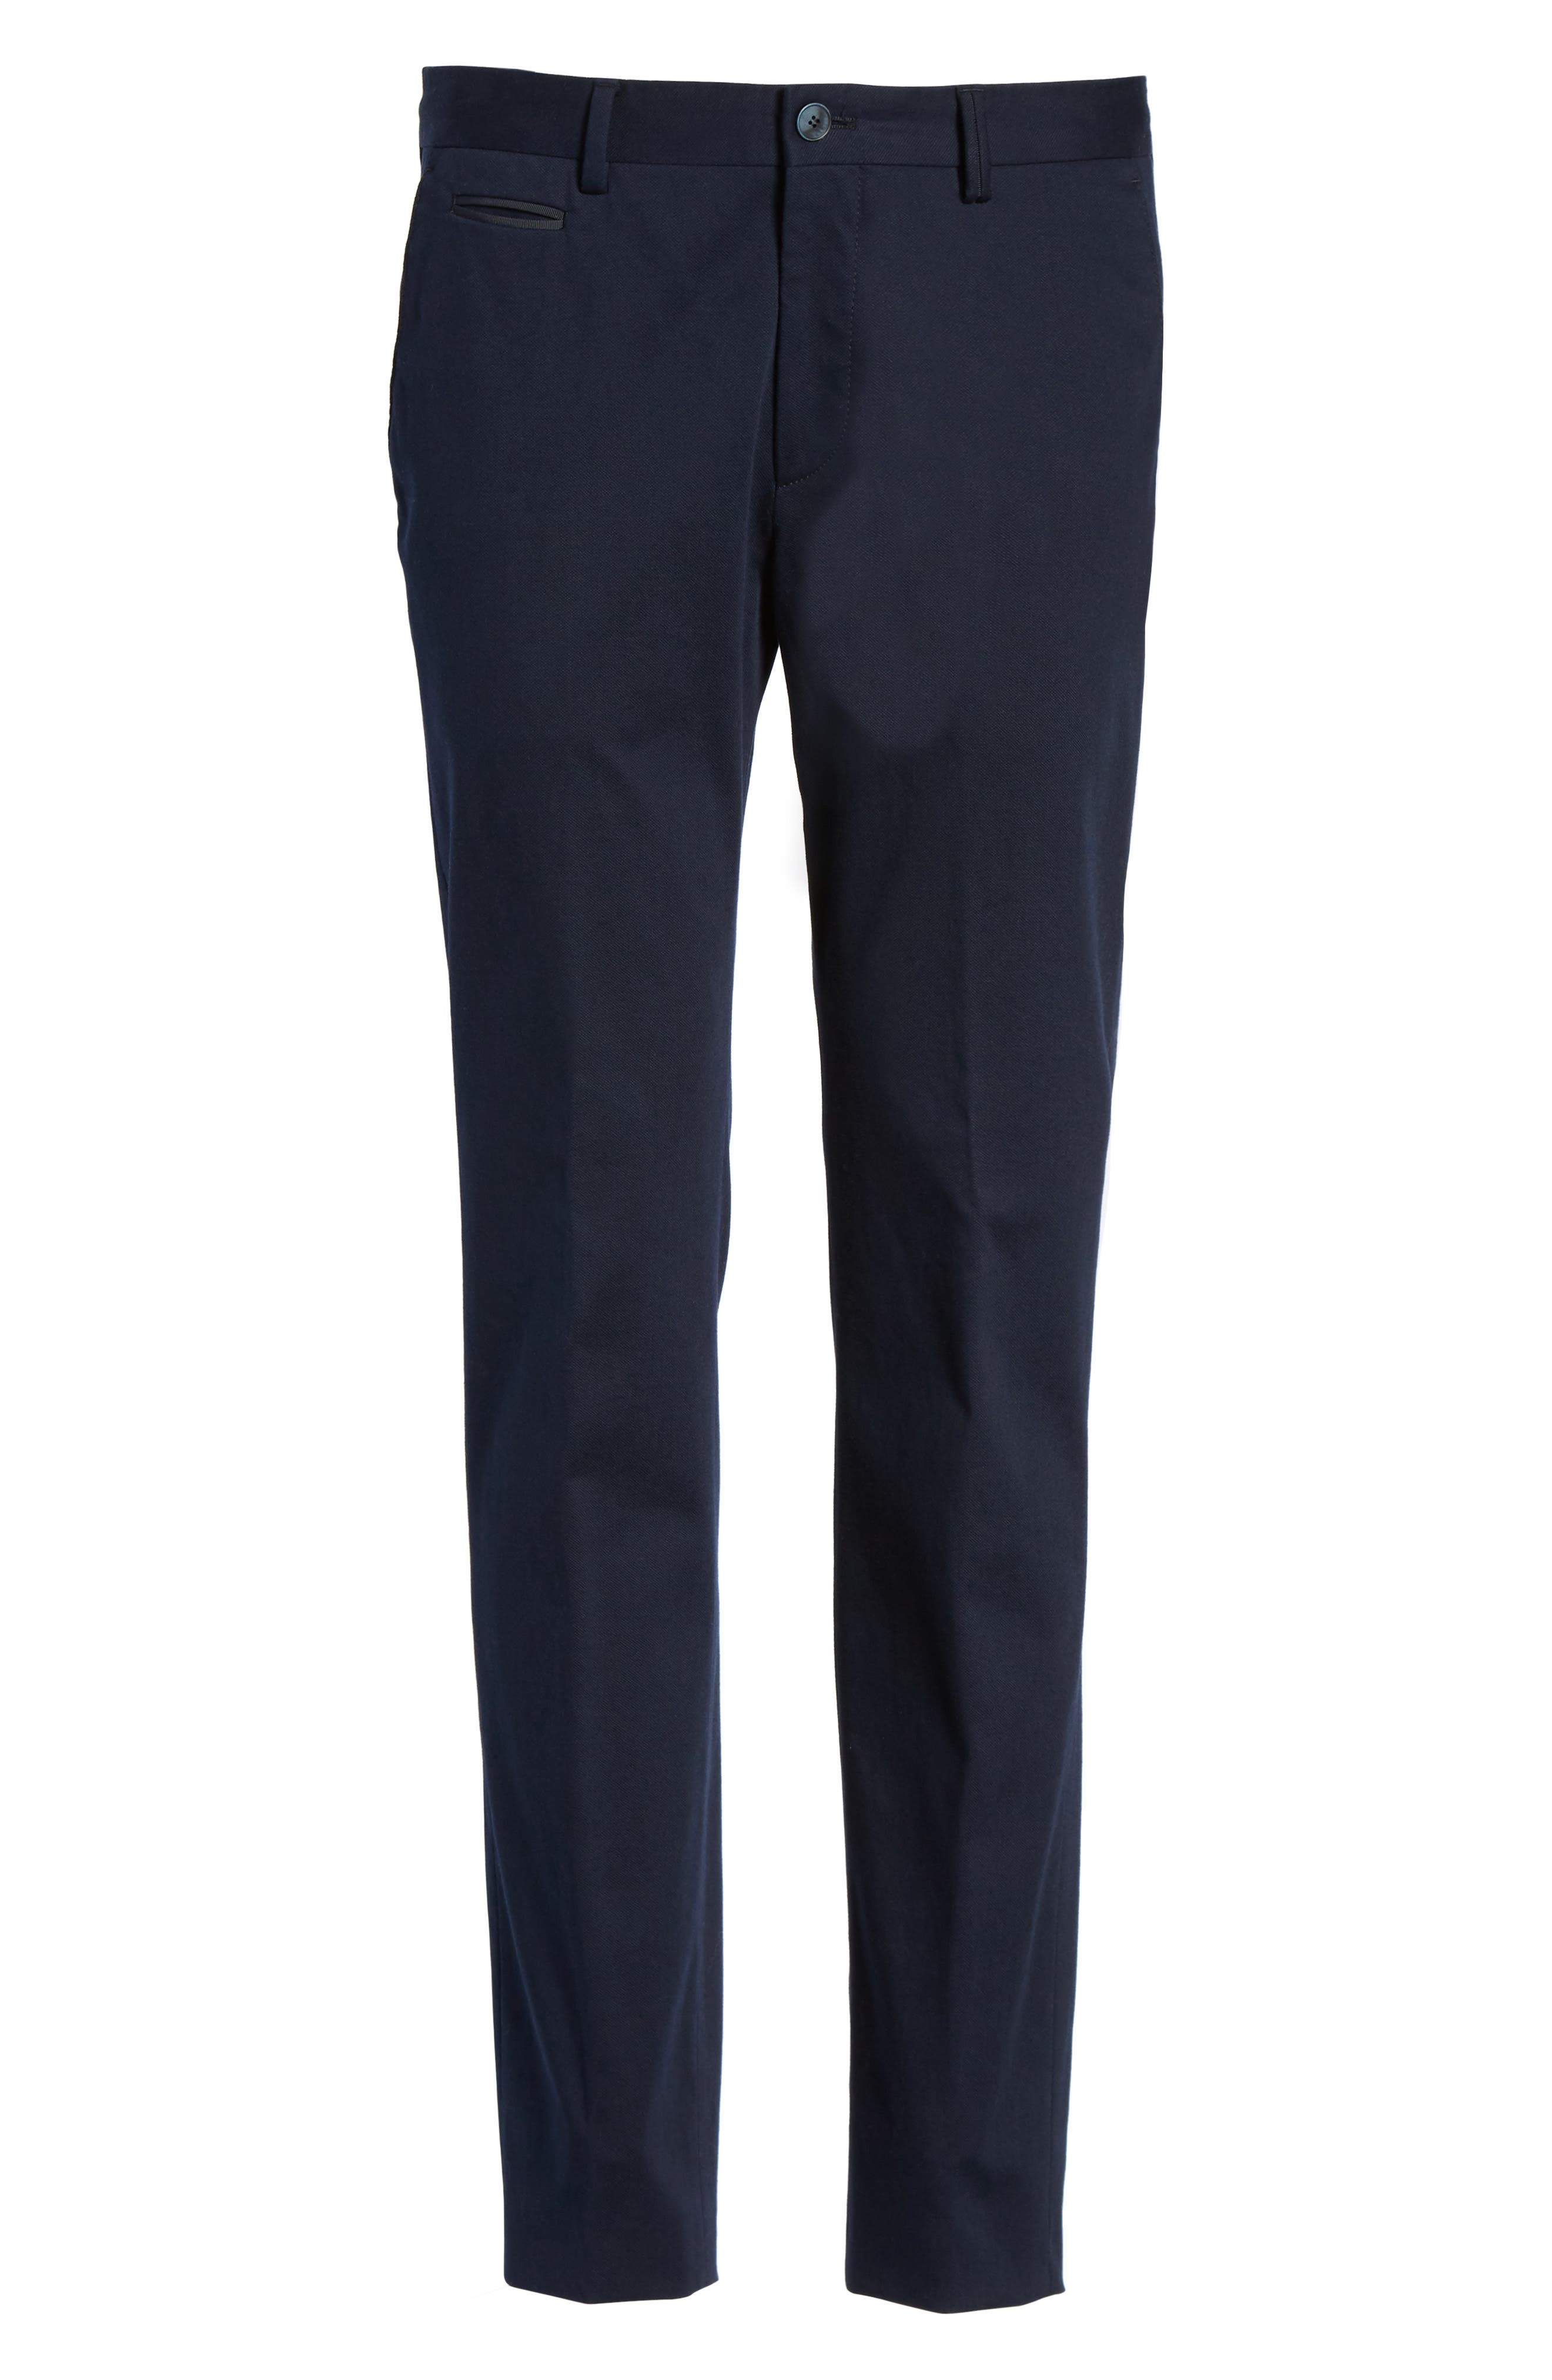 Batho-W Regular Fit Trousers,                             Alternate thumbnail 6, color,                             Navy